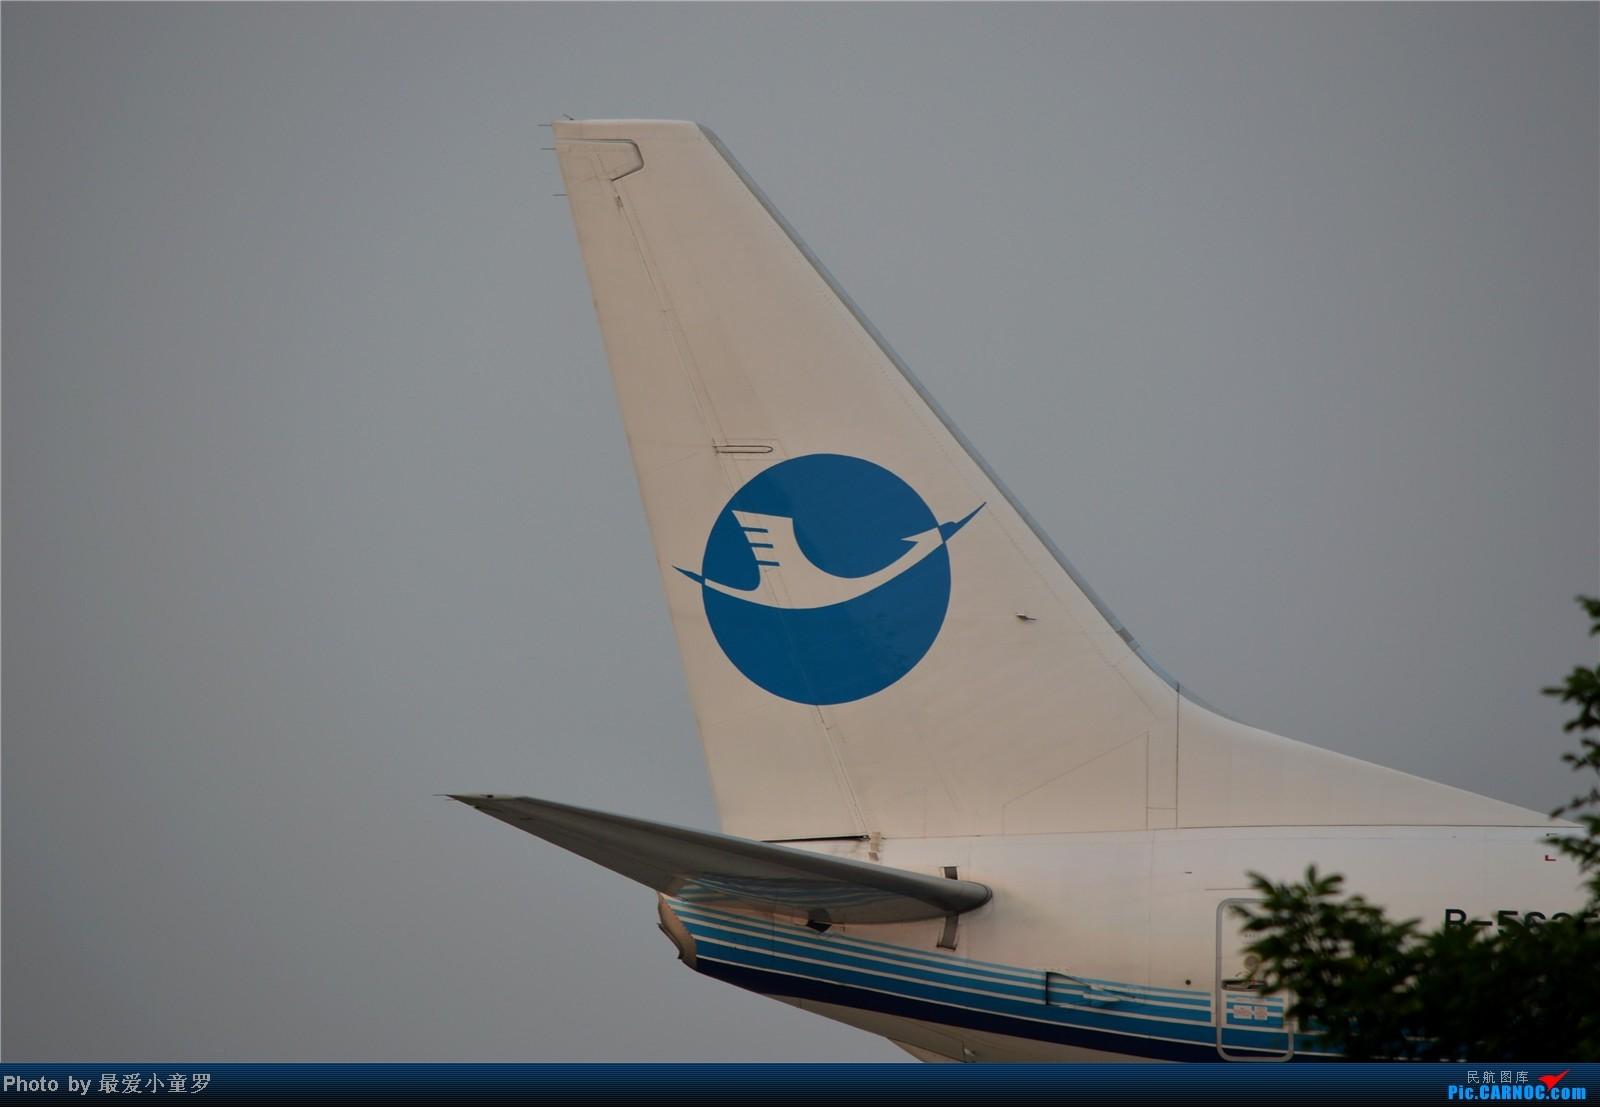 Re:[原创]炒冷饭系列2013年10月4日CAN拍机,带消防塔角度 BOEING 737-800